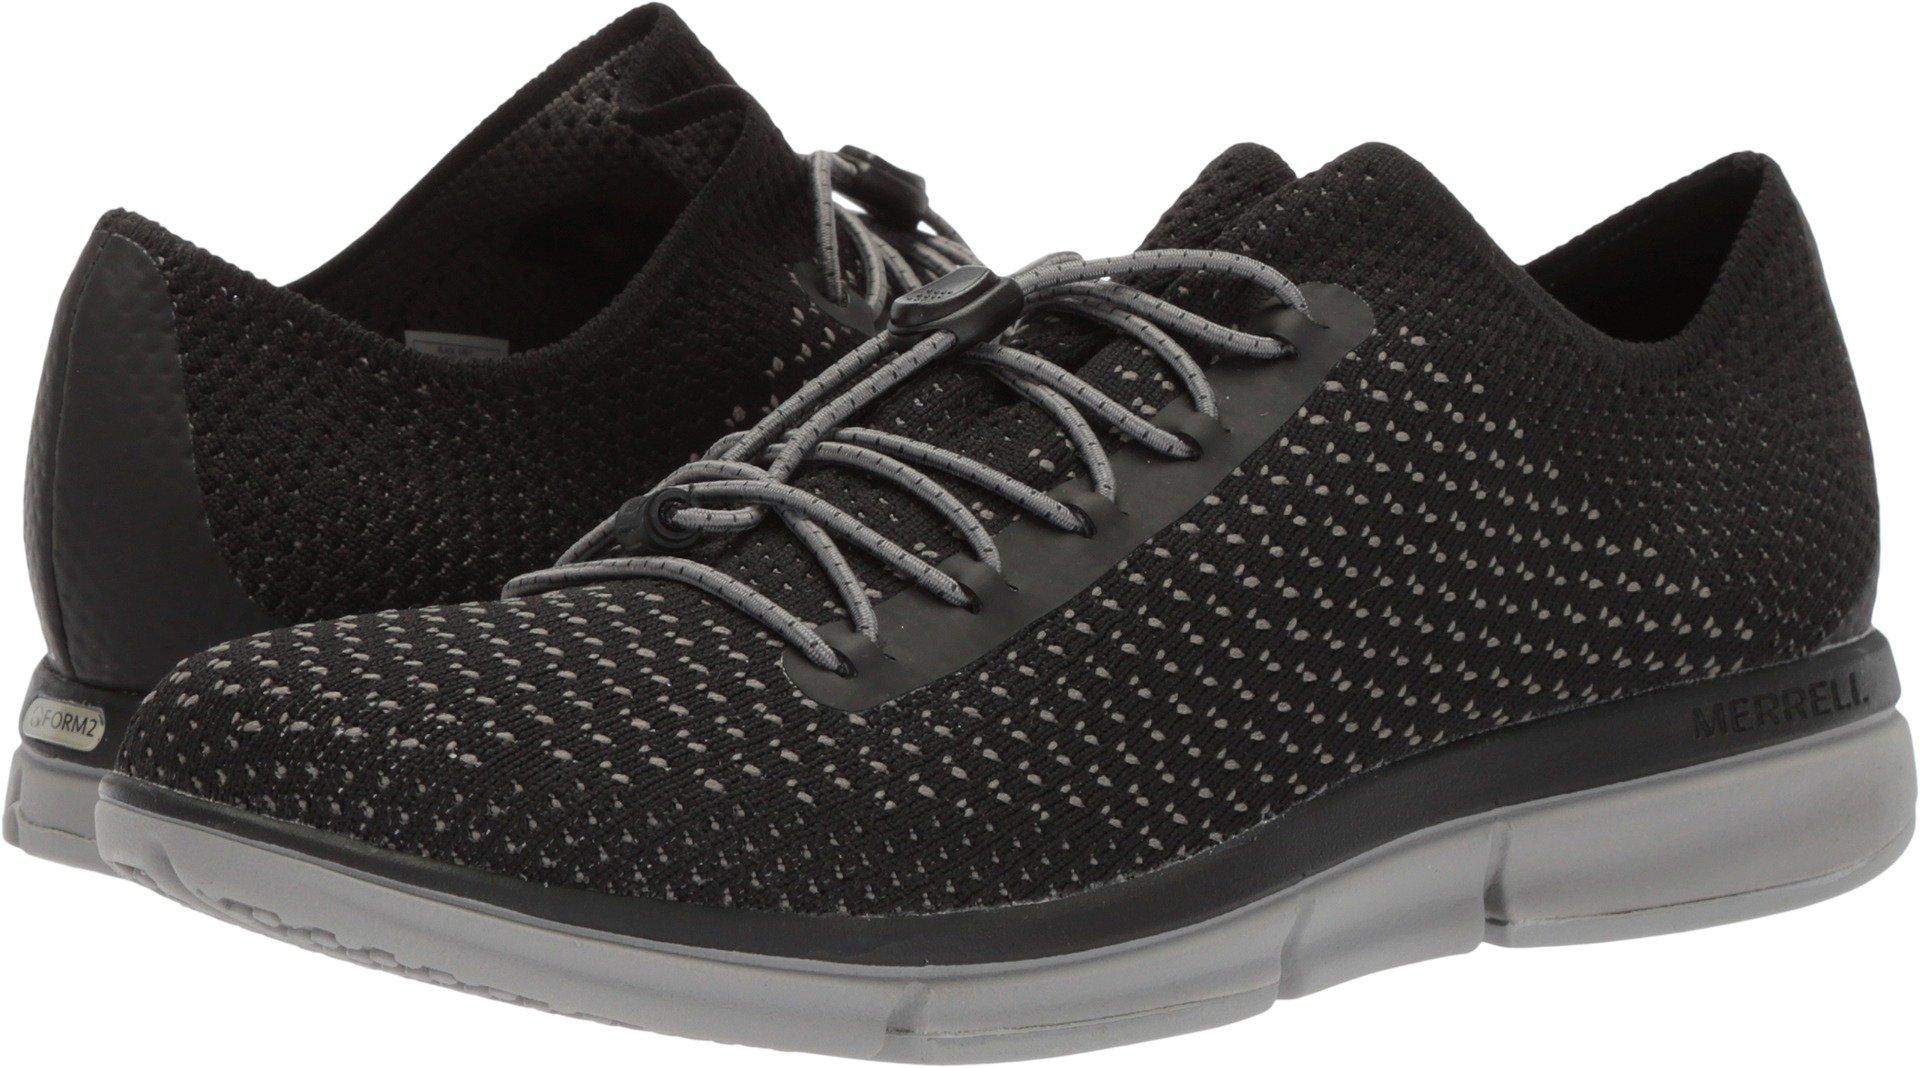 Merrell Womens Zoe Sojourn Lace Knit Q2 Lightweight Comfort Shoe, Black/Grey, 9 B(M) US